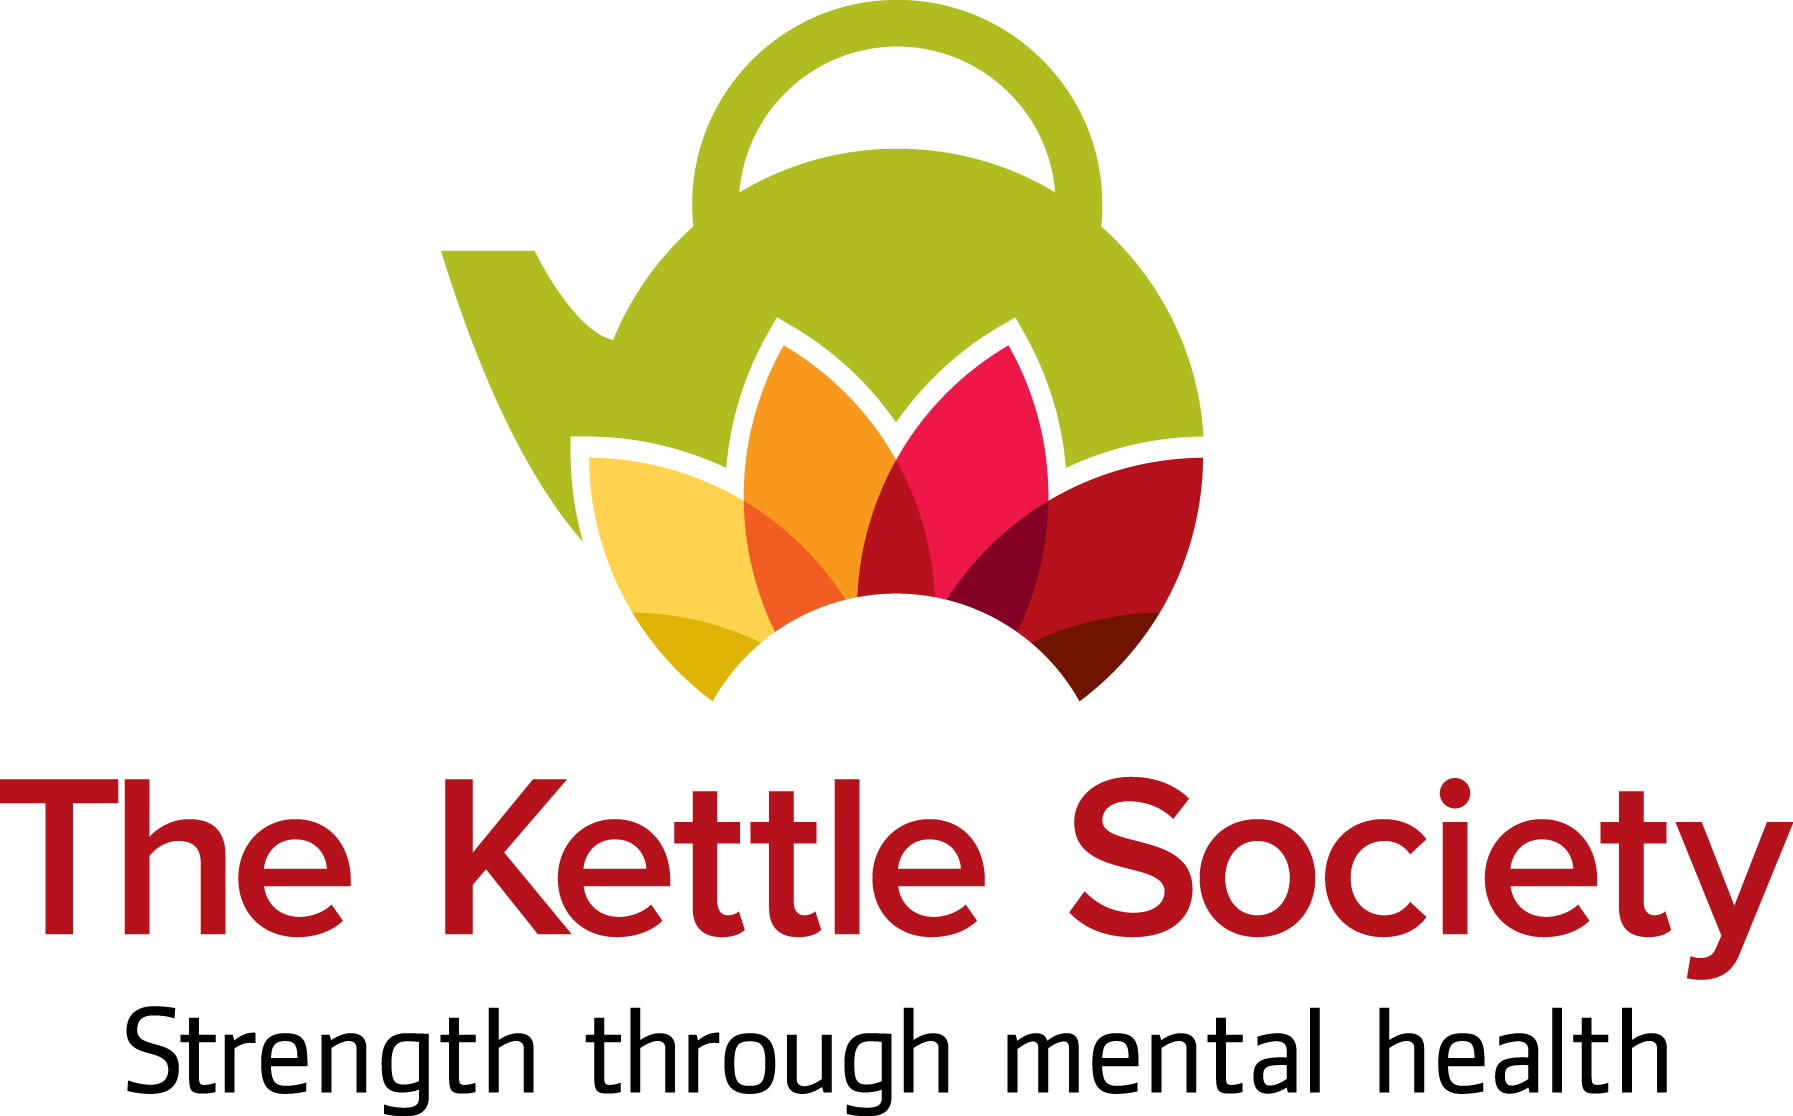 Kettle-logo-png.png